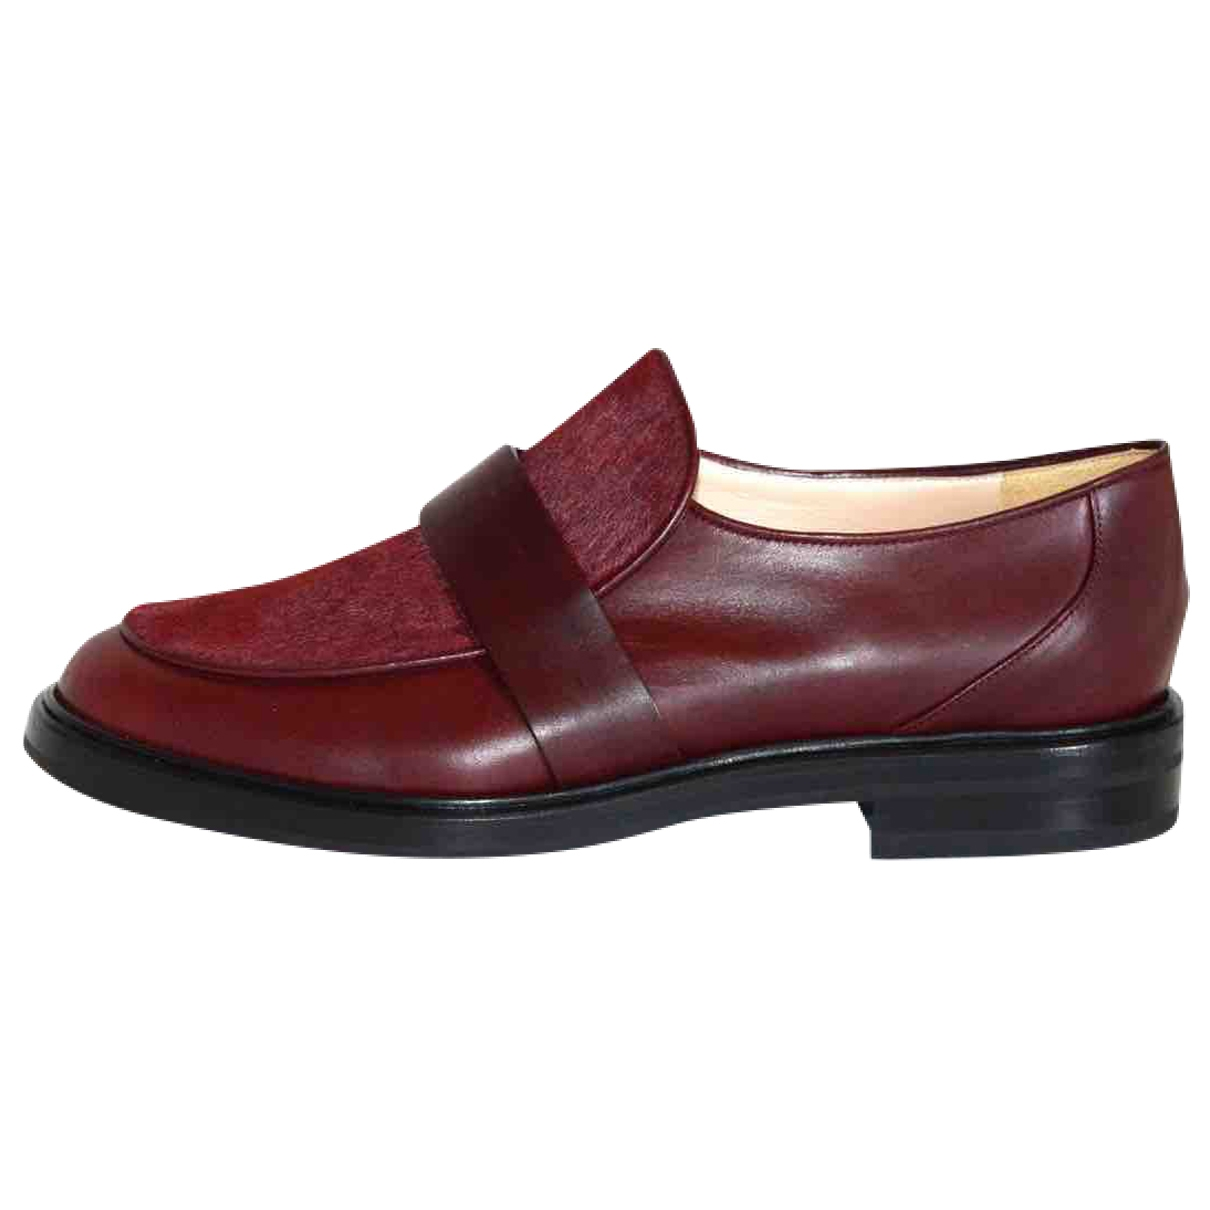 Casadei \N Burgundy Leather Flats for Women 36.5 EU